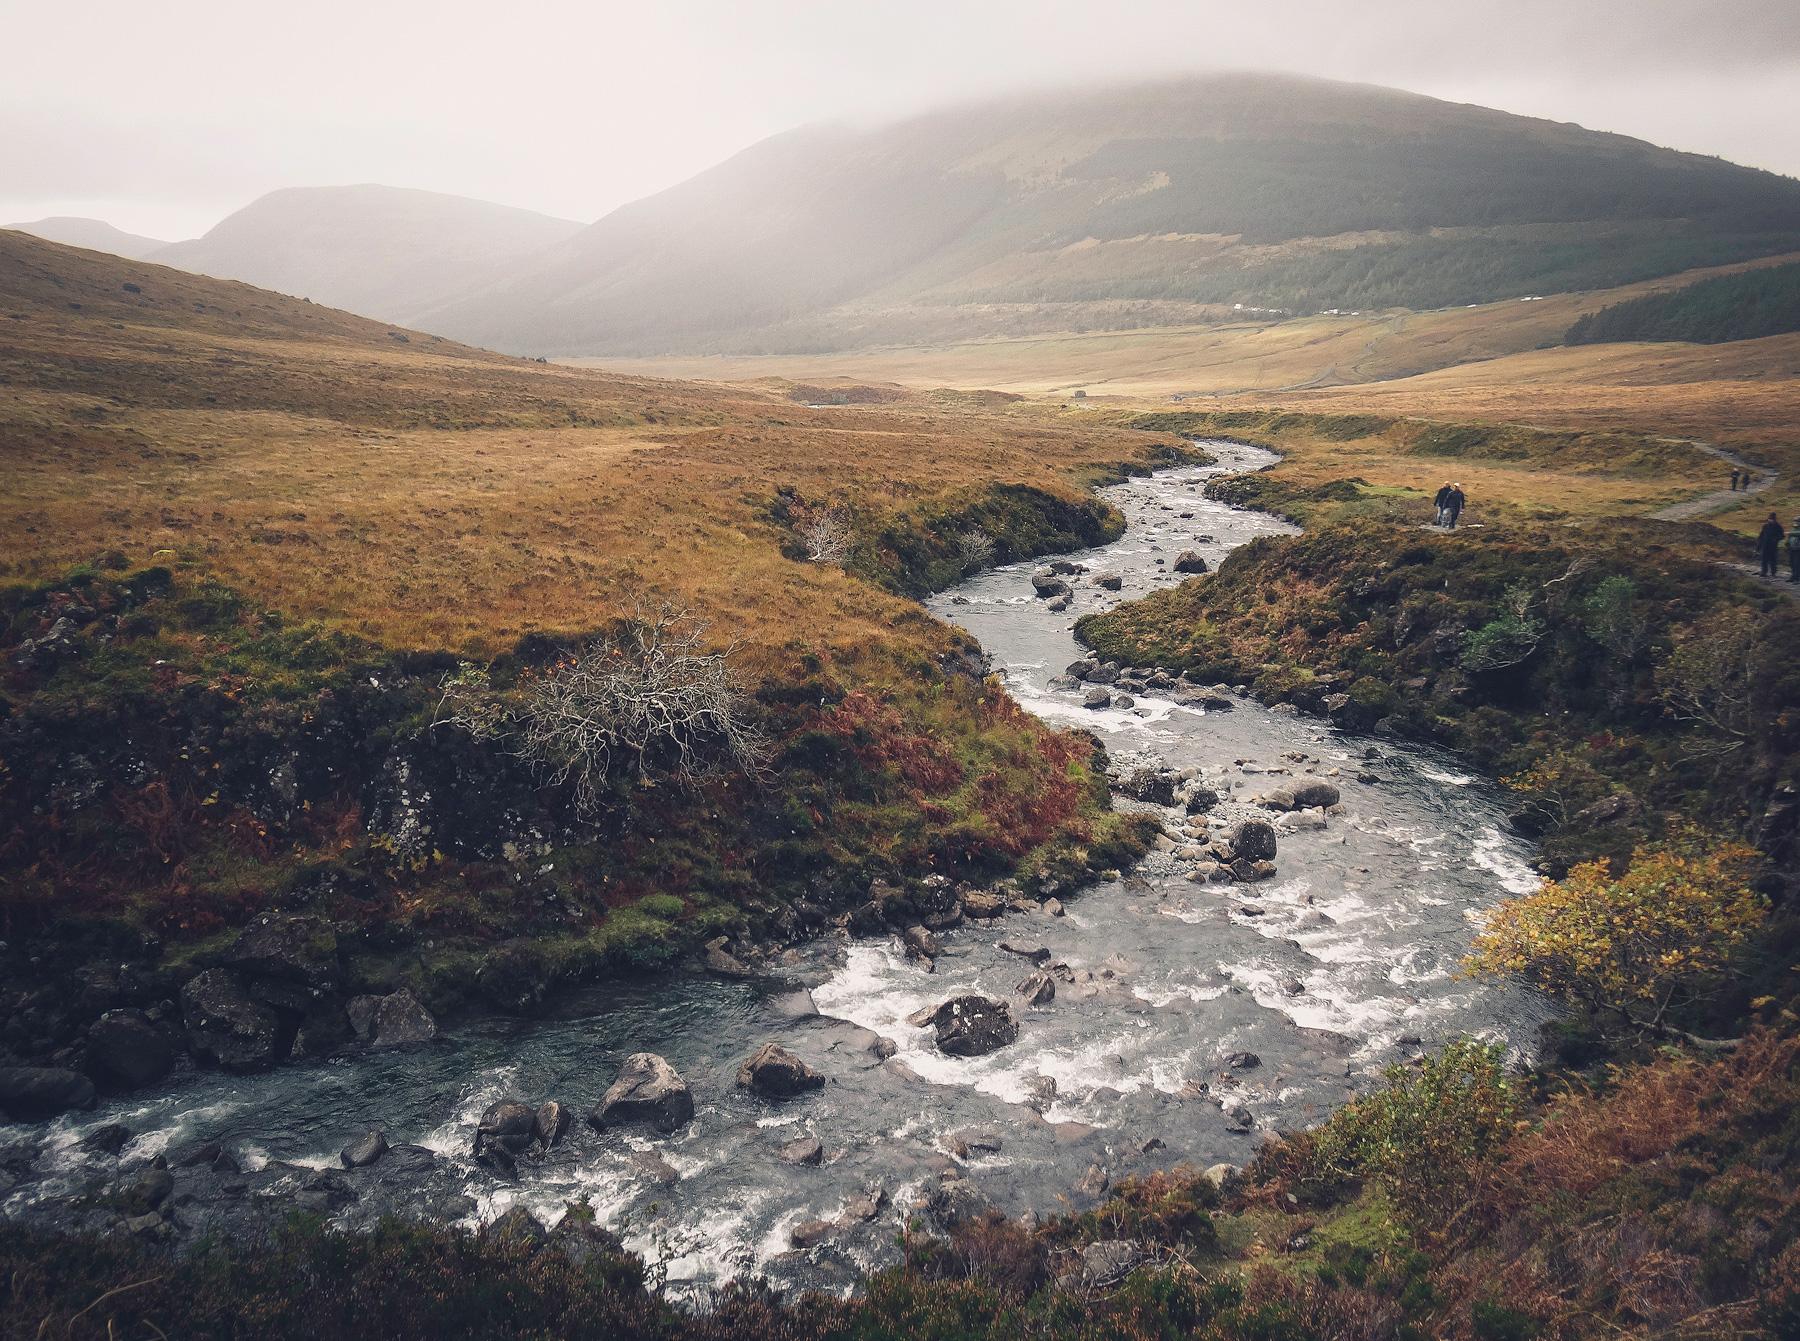 Jaworskyj Fotoreise, Lukas Voegelin, Schottland, Isle of Skye, Fluss, Fairy Pools, Wasserfall, Highlands